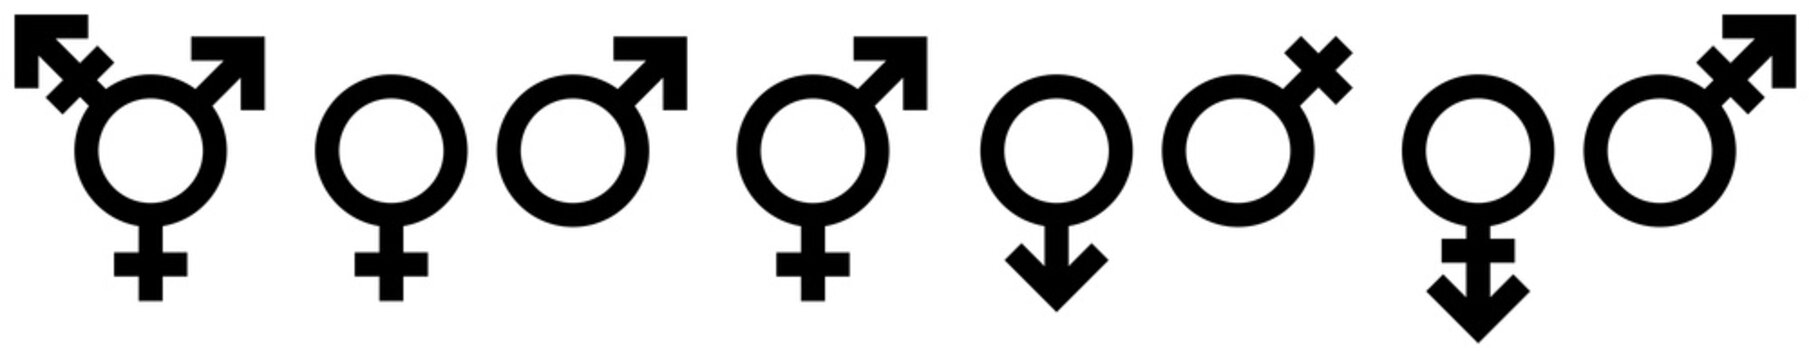 Icons Geschlechter Schwarz